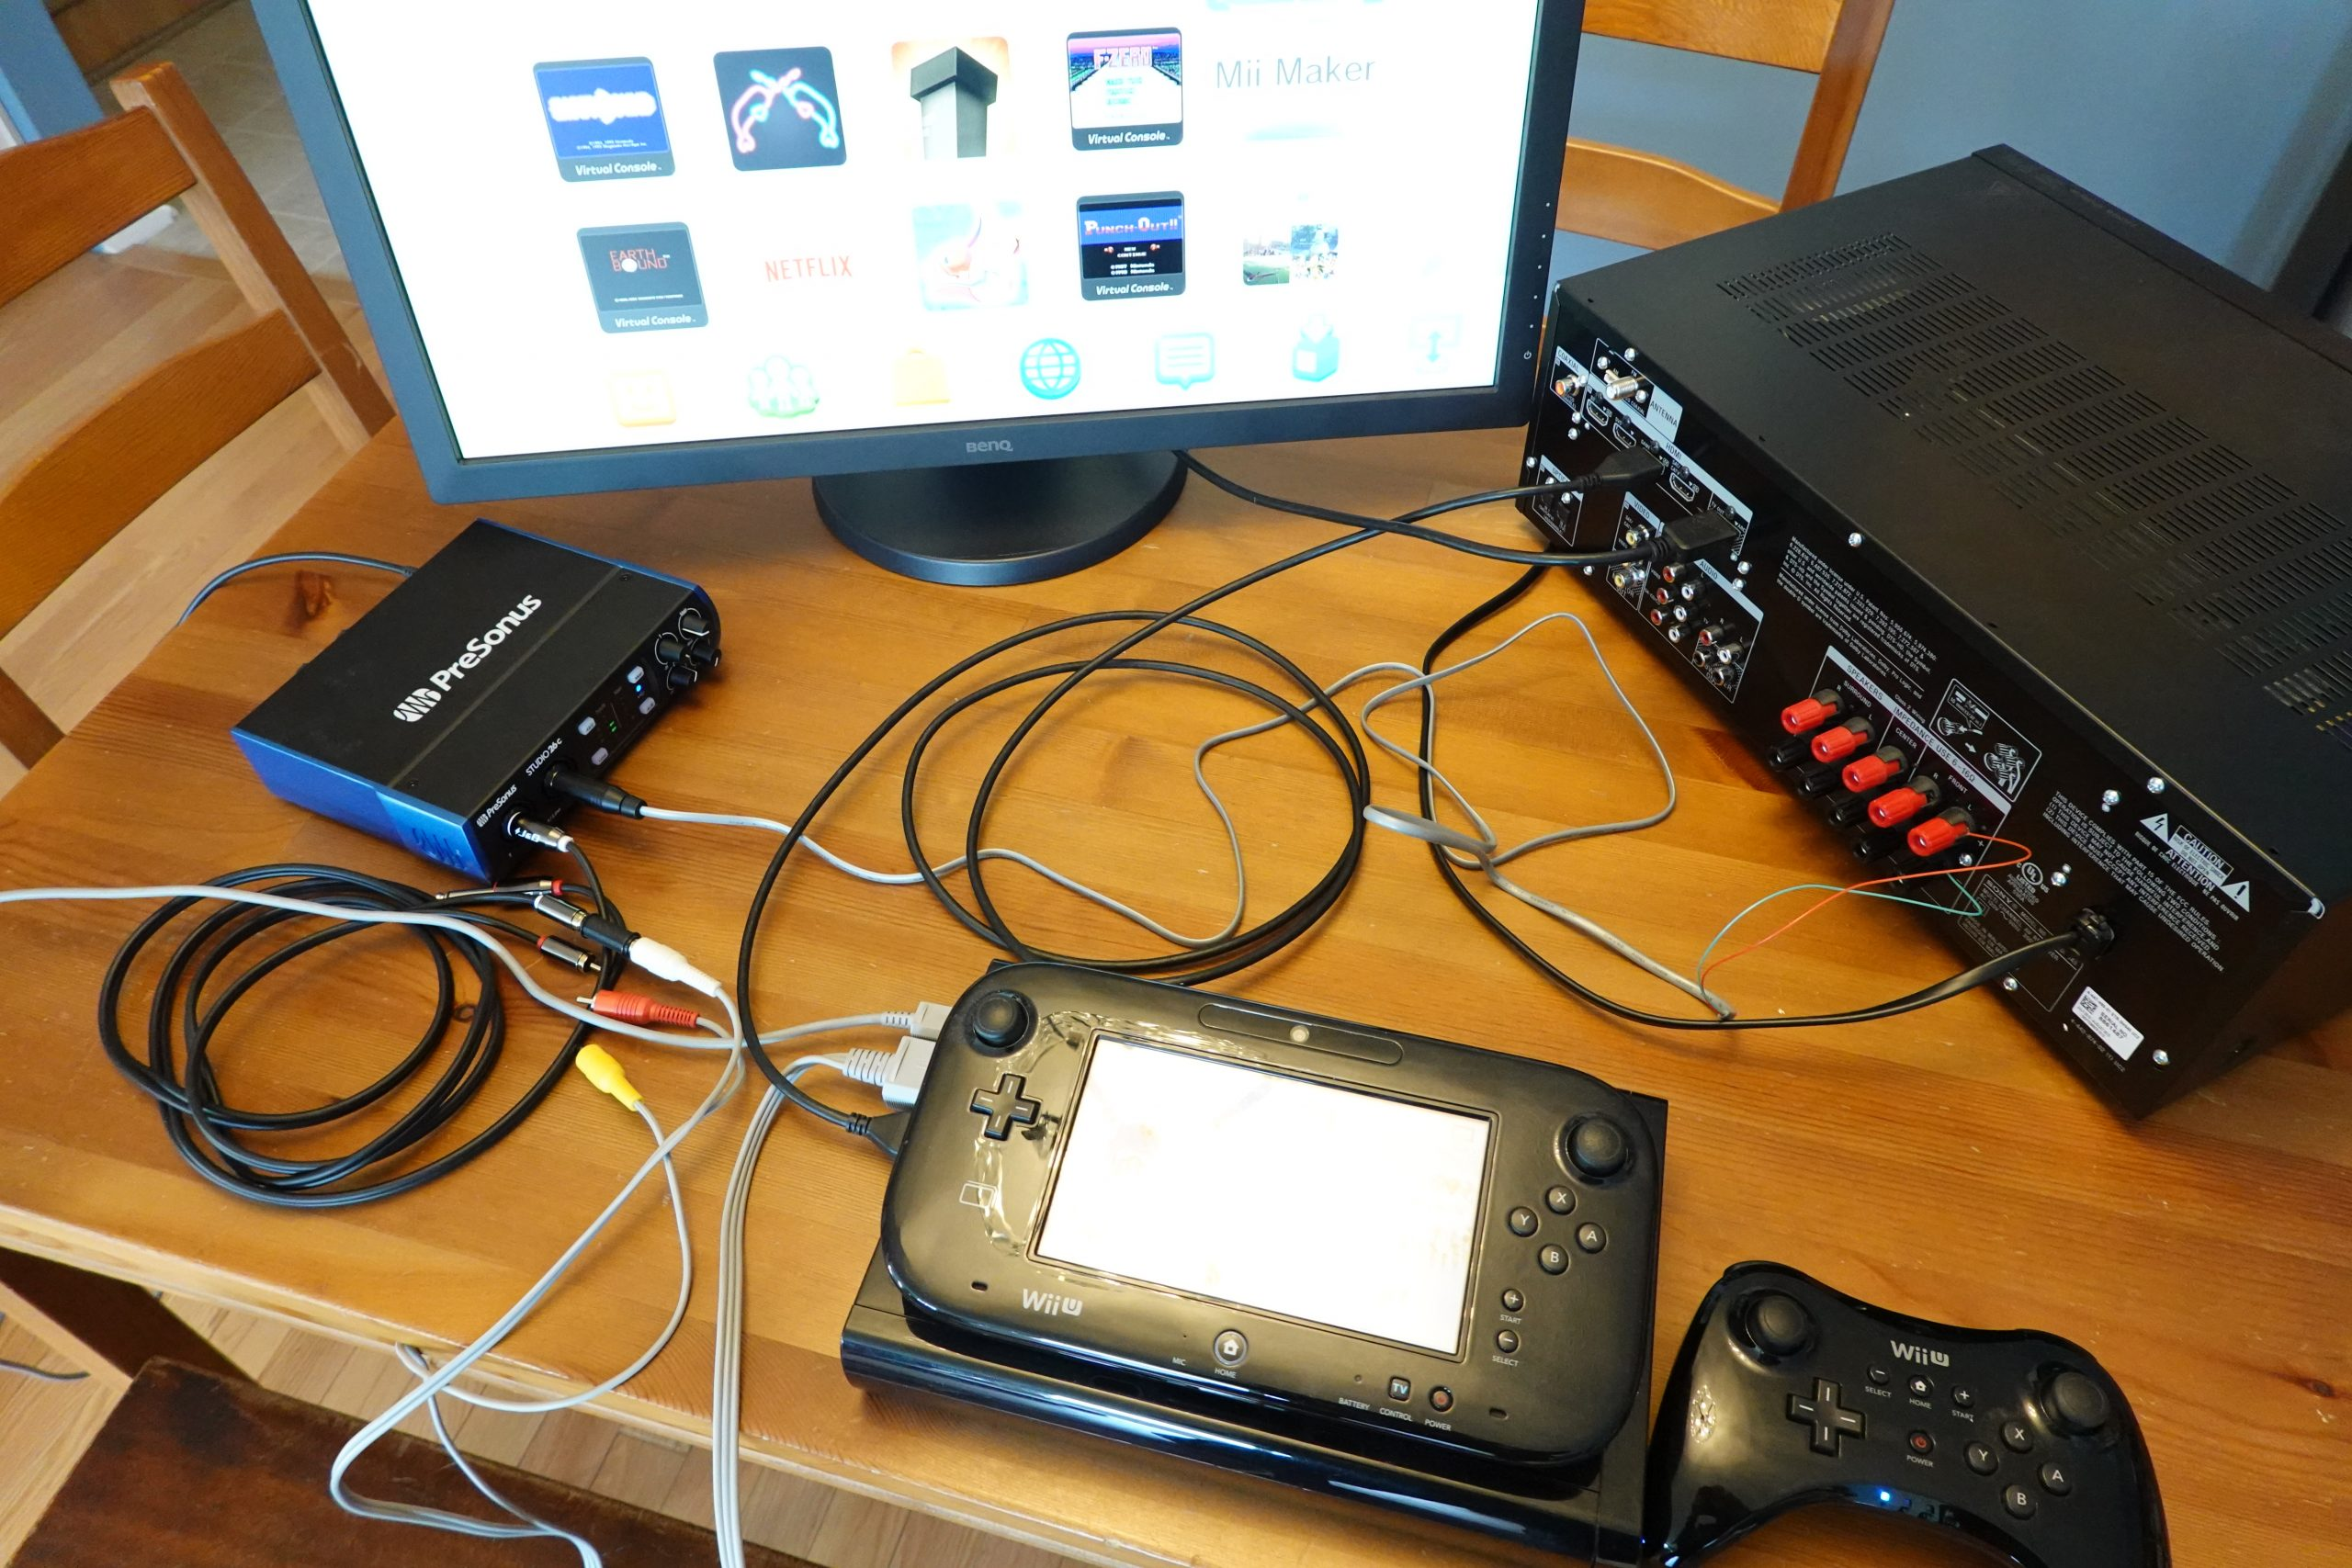 Using a Nintendo Wii U to measure HDMI audio delay / audio input lag